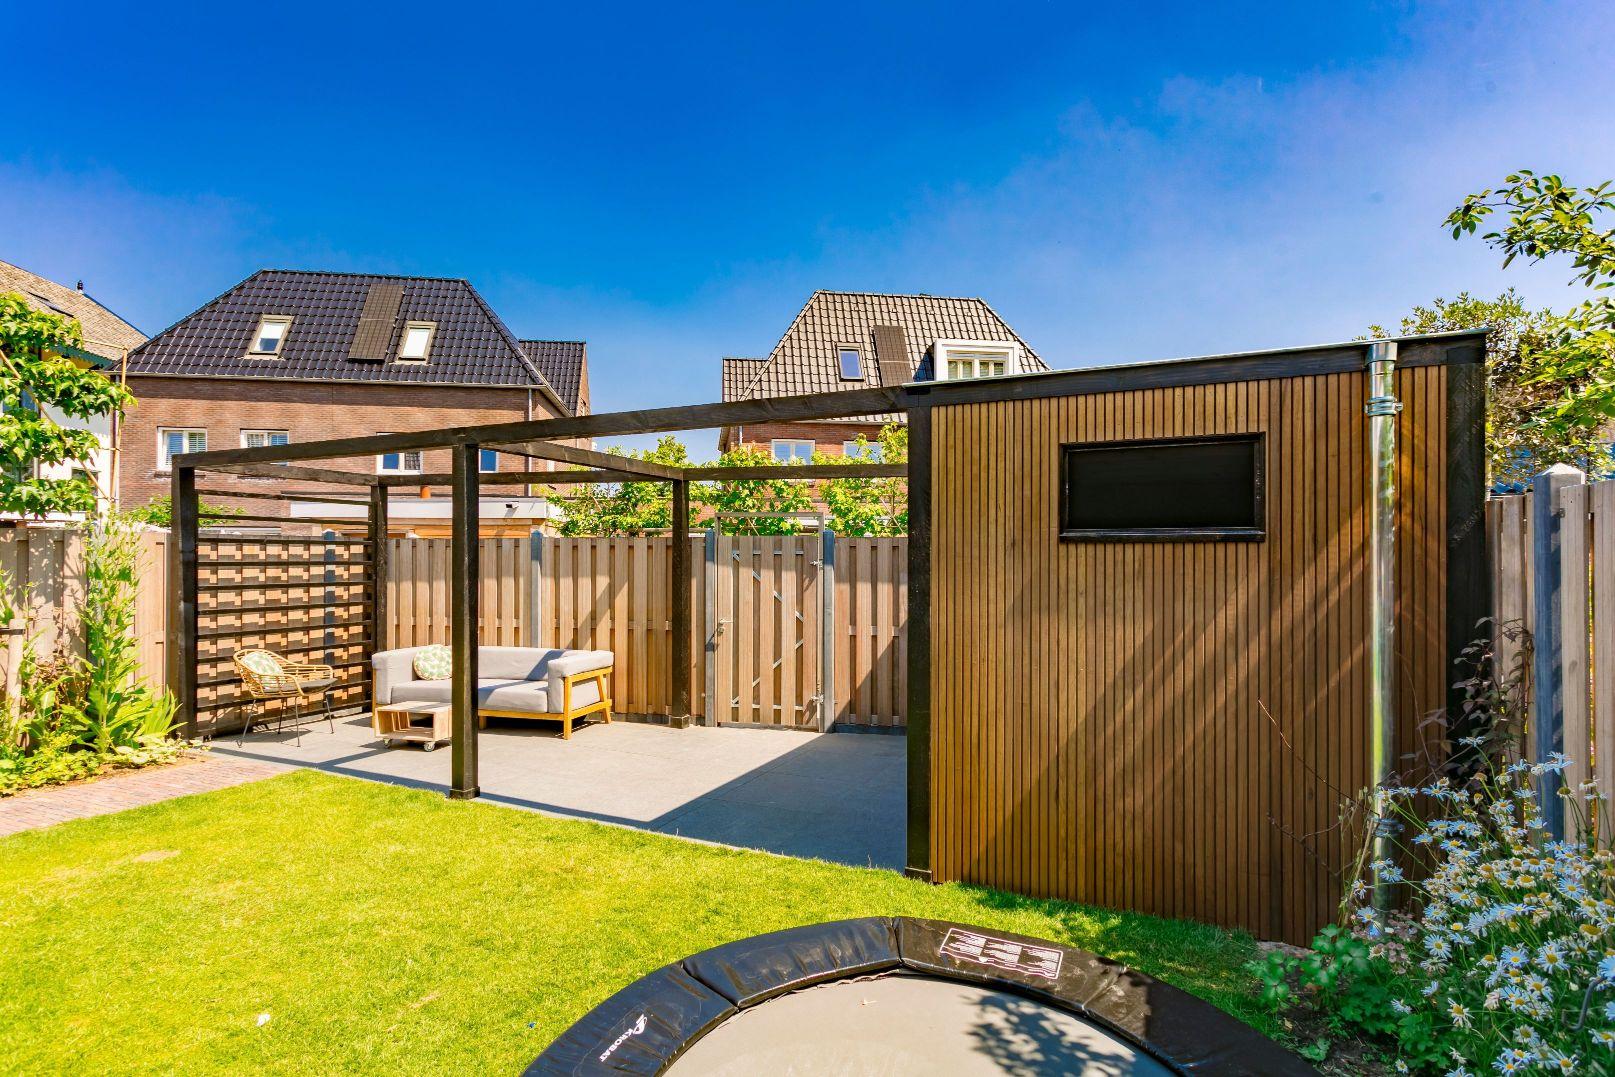 Aanleg pergola en terras nieuwbouwtuin